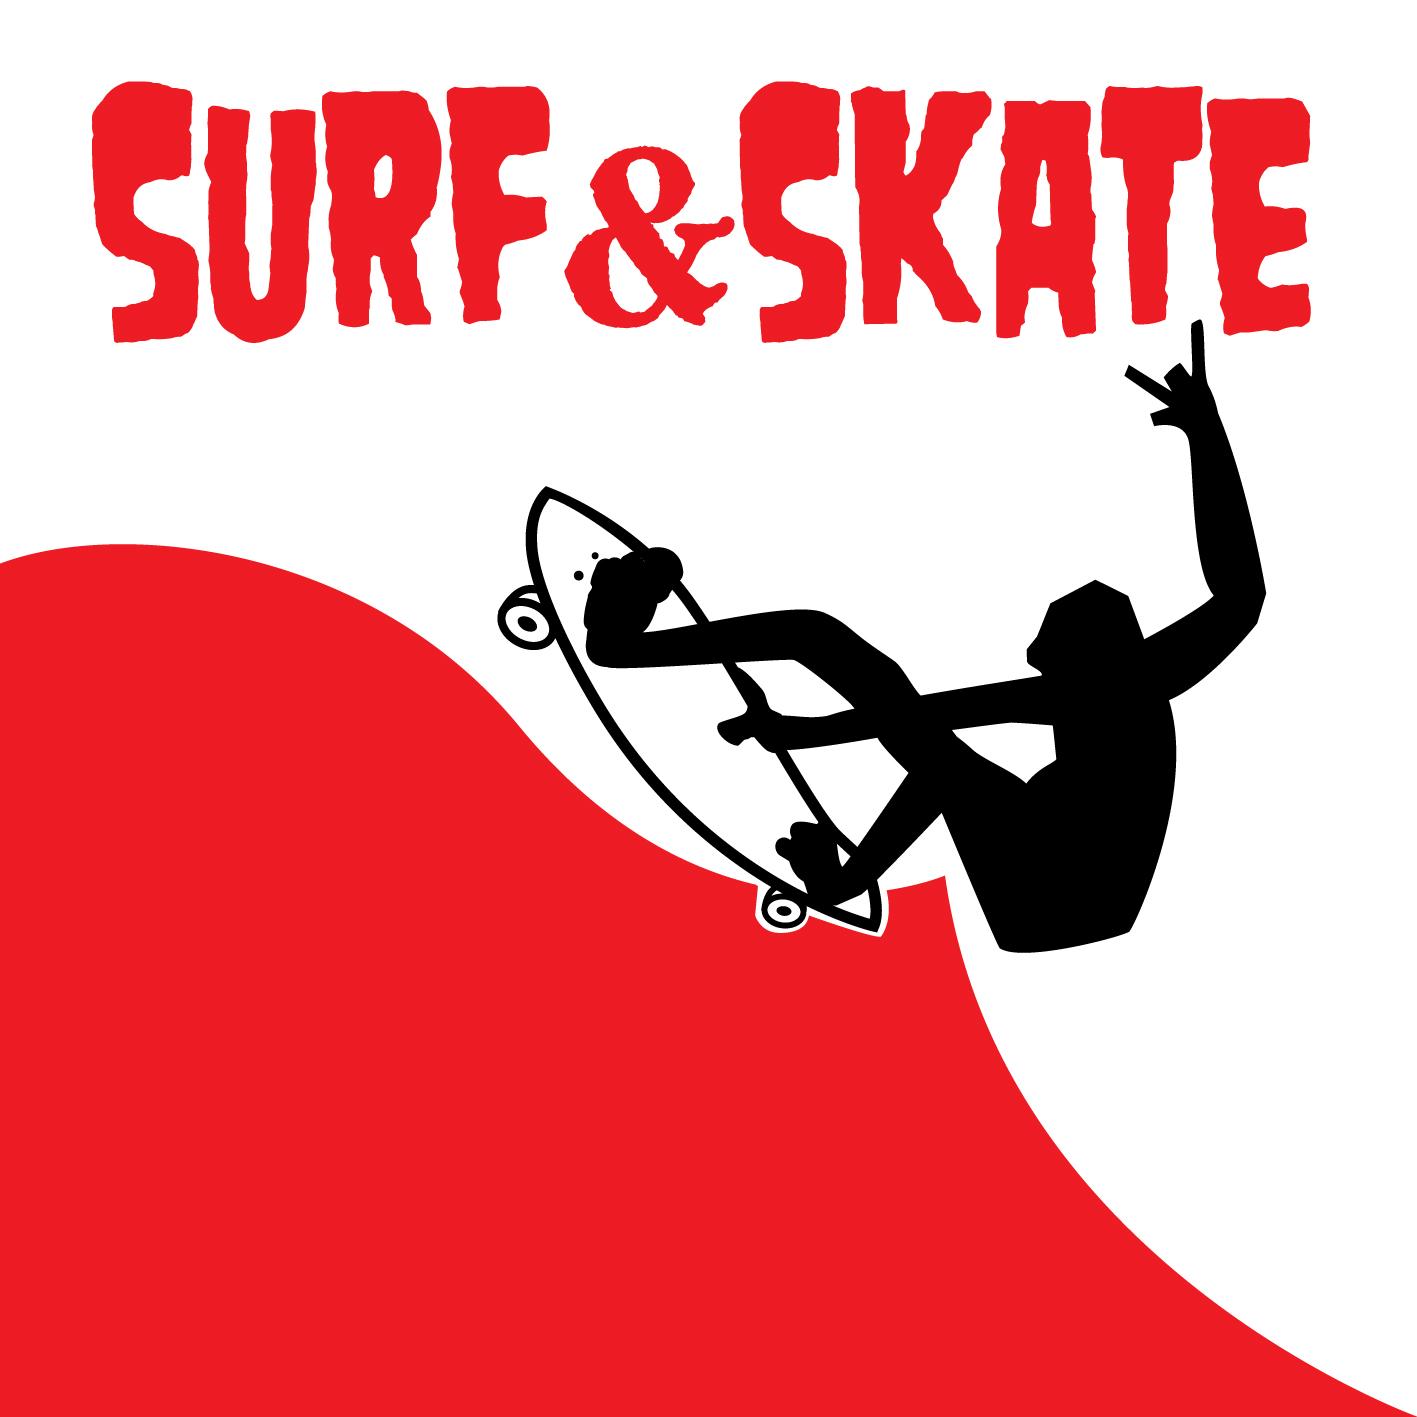 Surfskate y skate orientado al surf